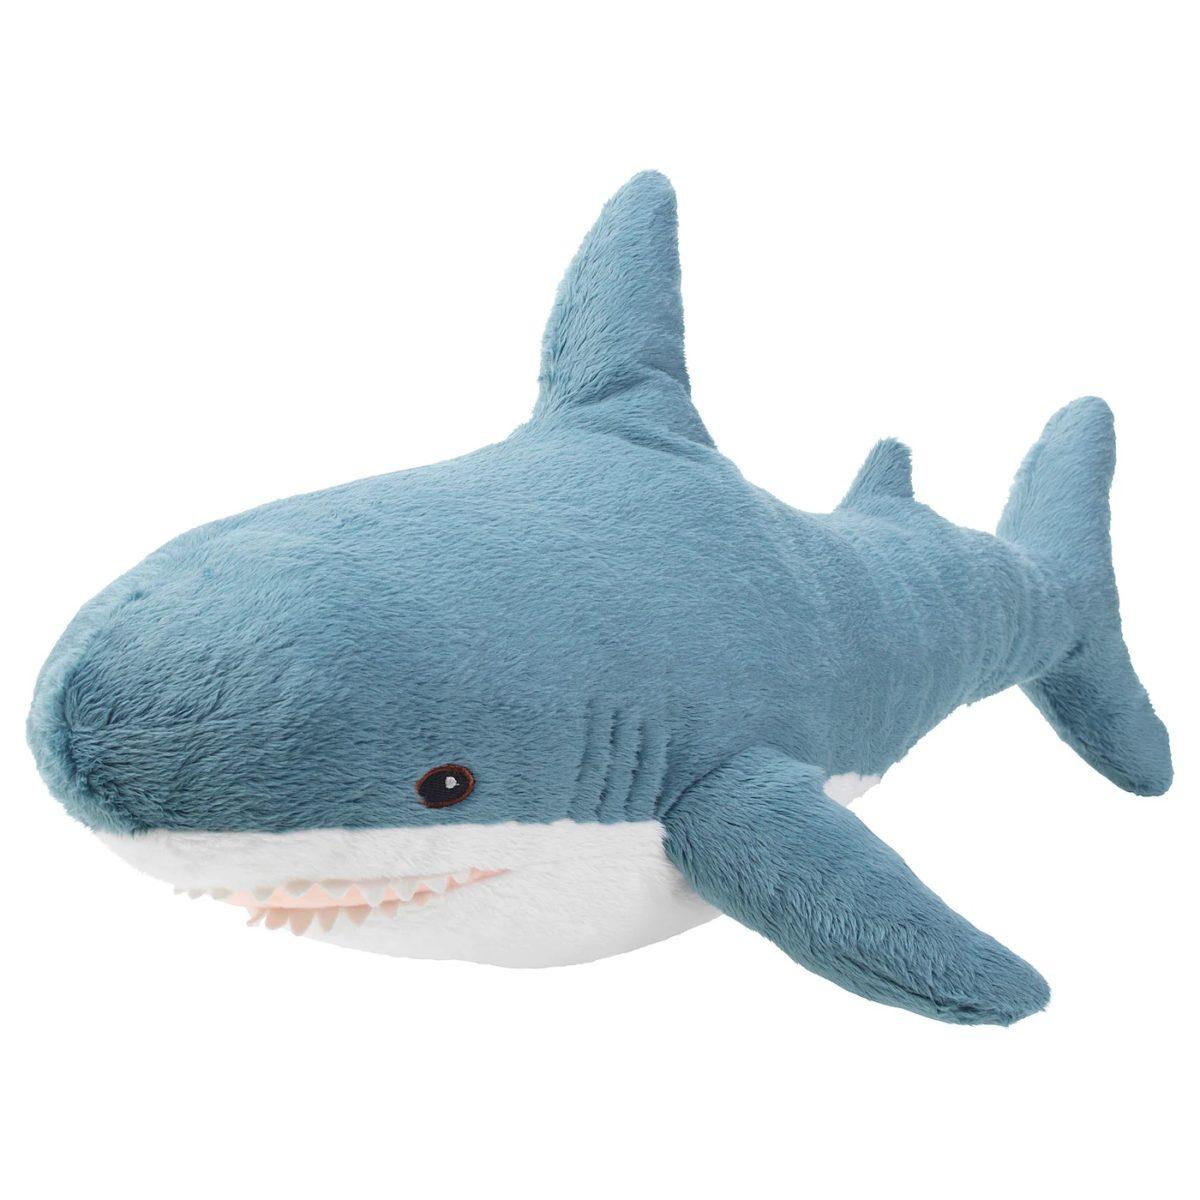 ikea-giocattolo-squalo